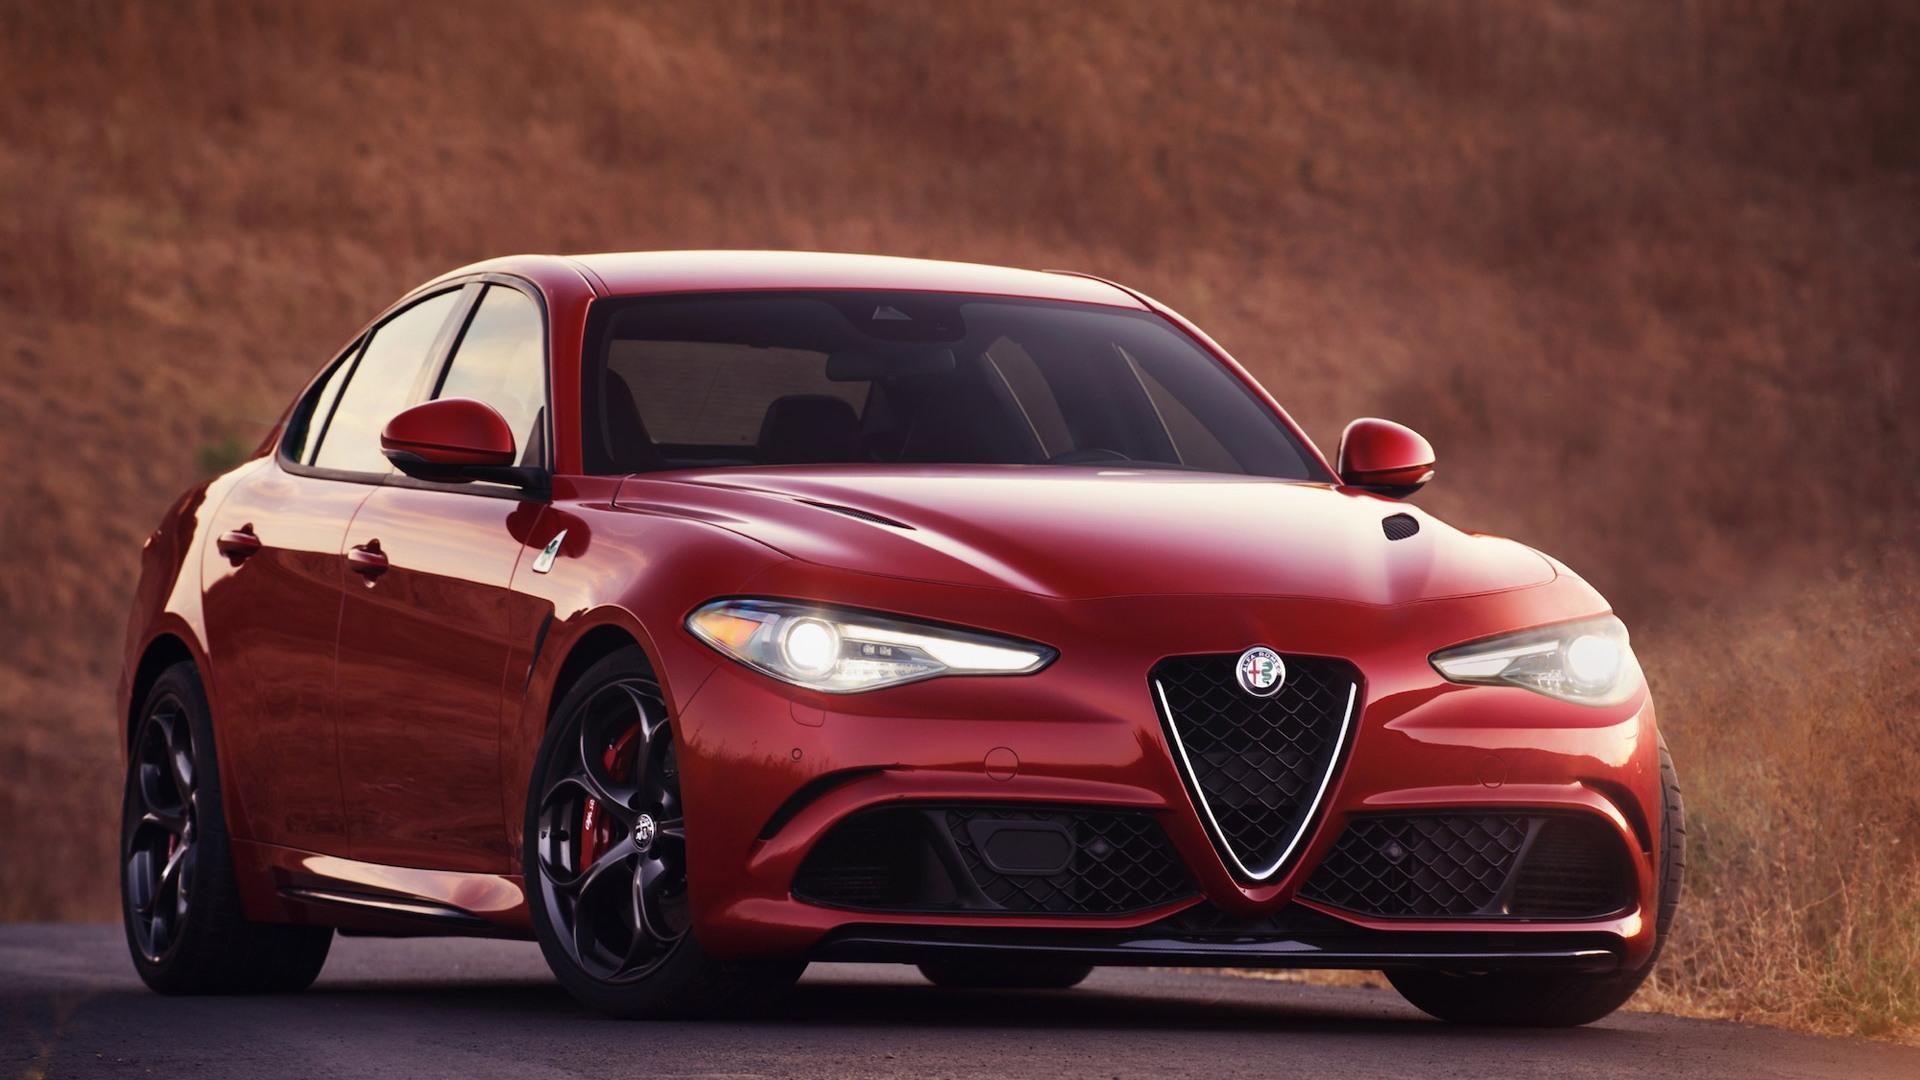 Alfa Romeo Giulia Reclaims 4 Door Nurburgring Record With Blistering